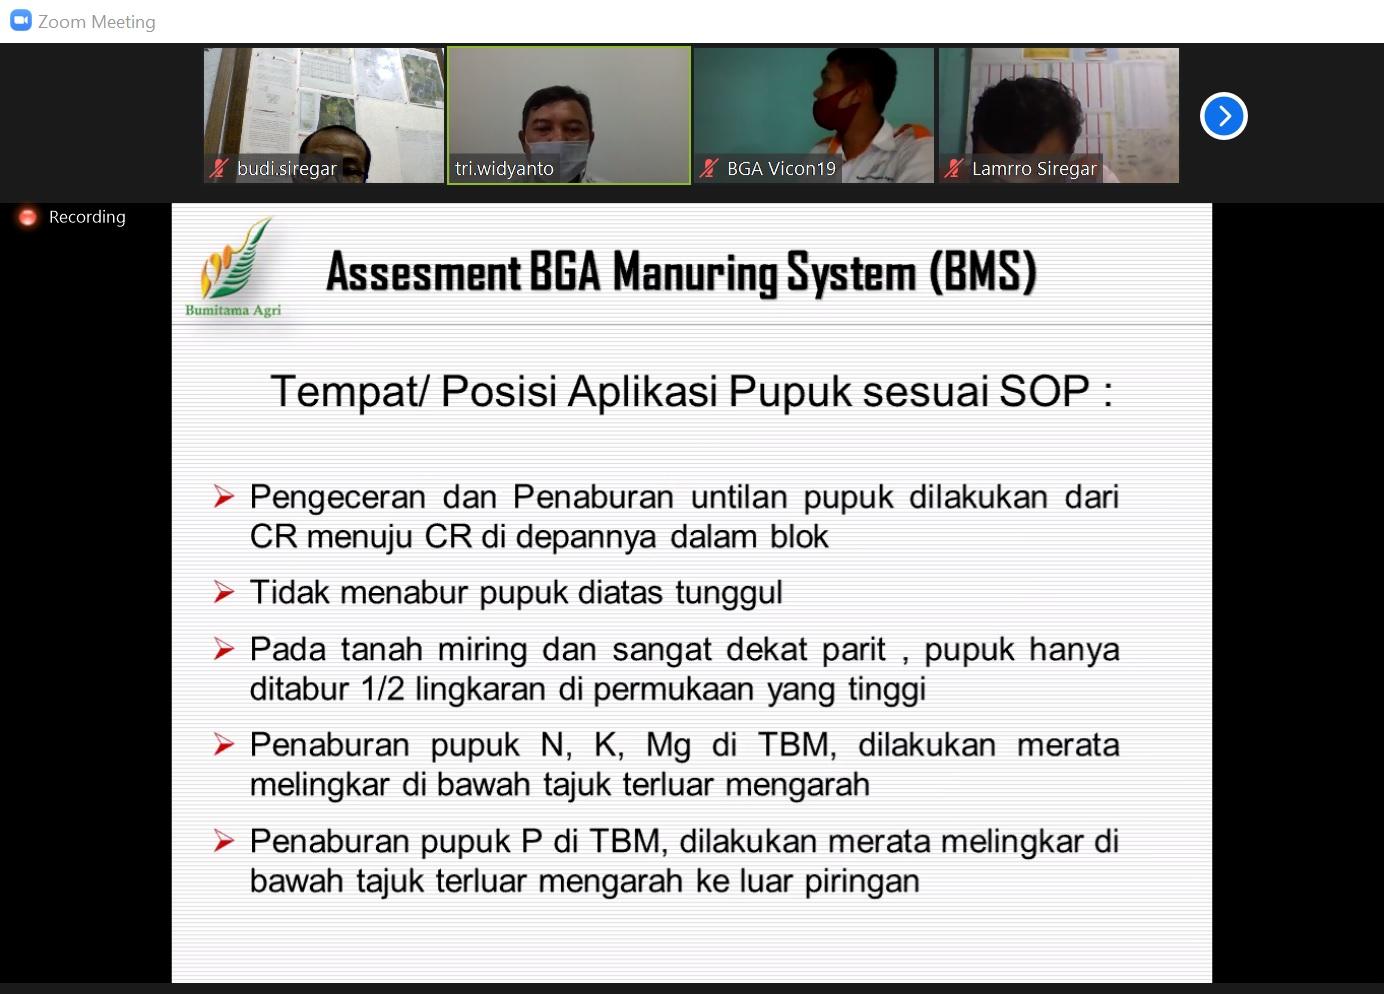 Asesment BMS - Tempat Aplikasi Pupuk